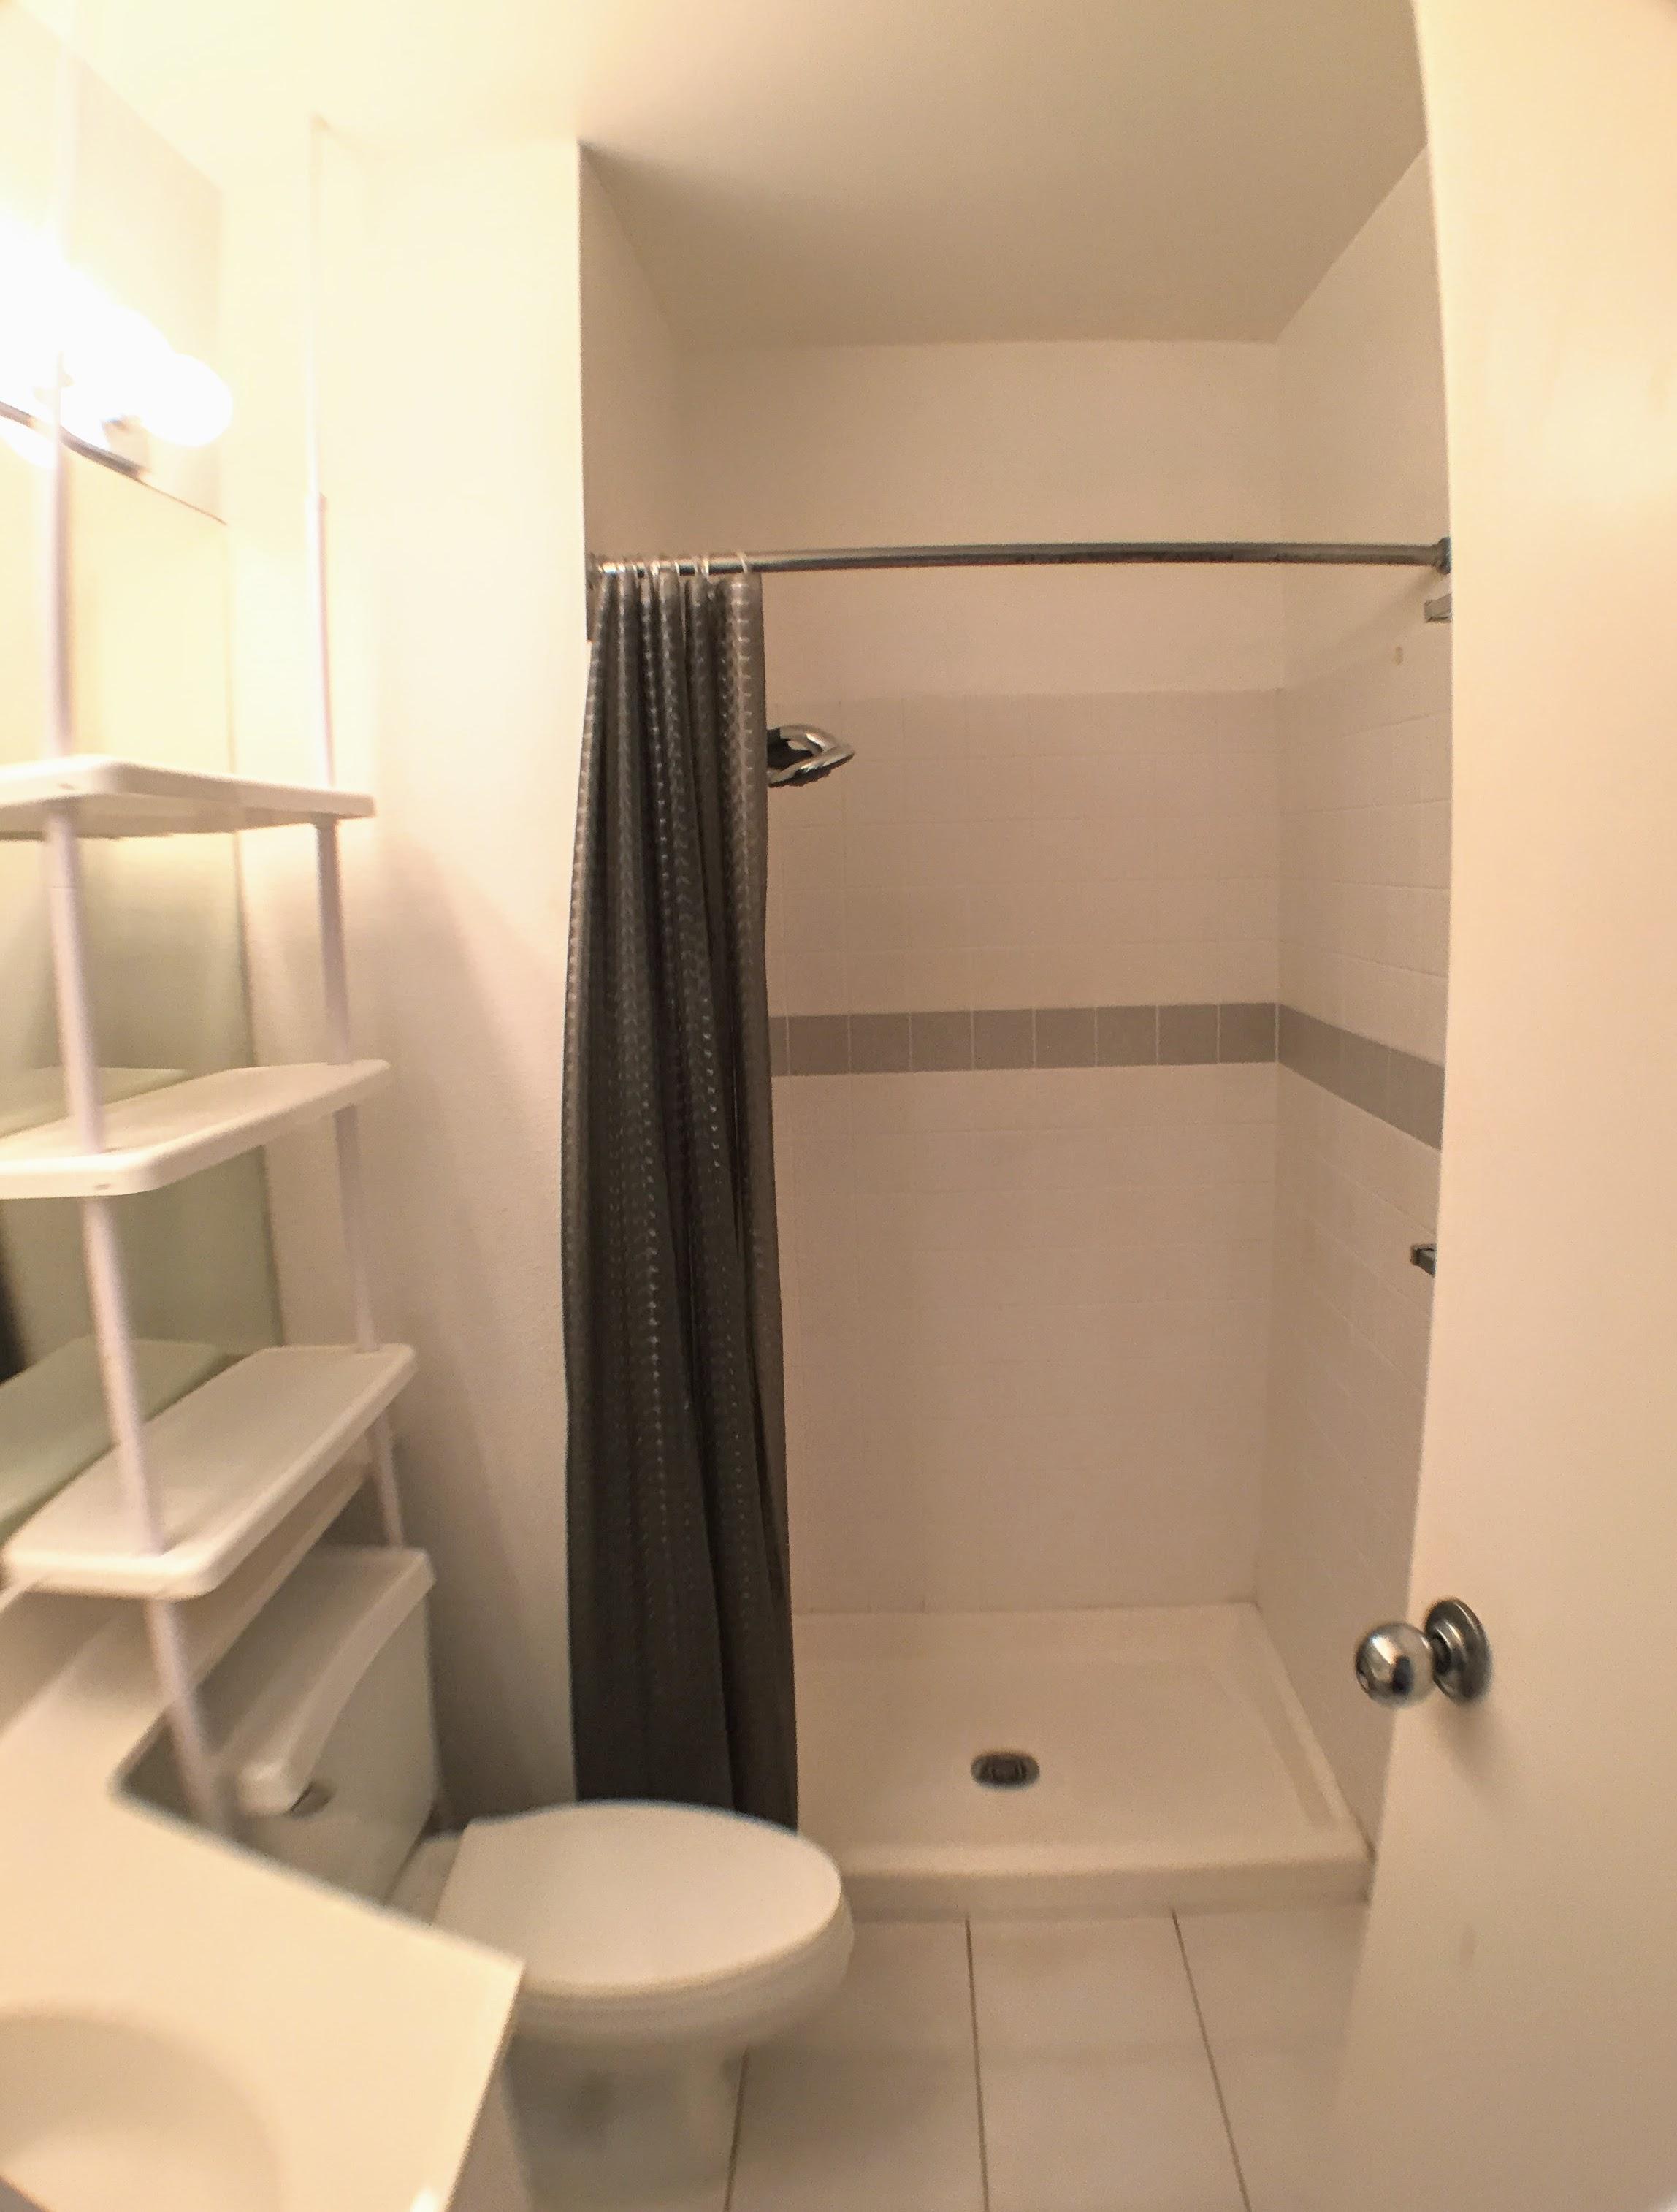 Second Bathroom at 94-970 Lumiauau Street #J202 Waipahu